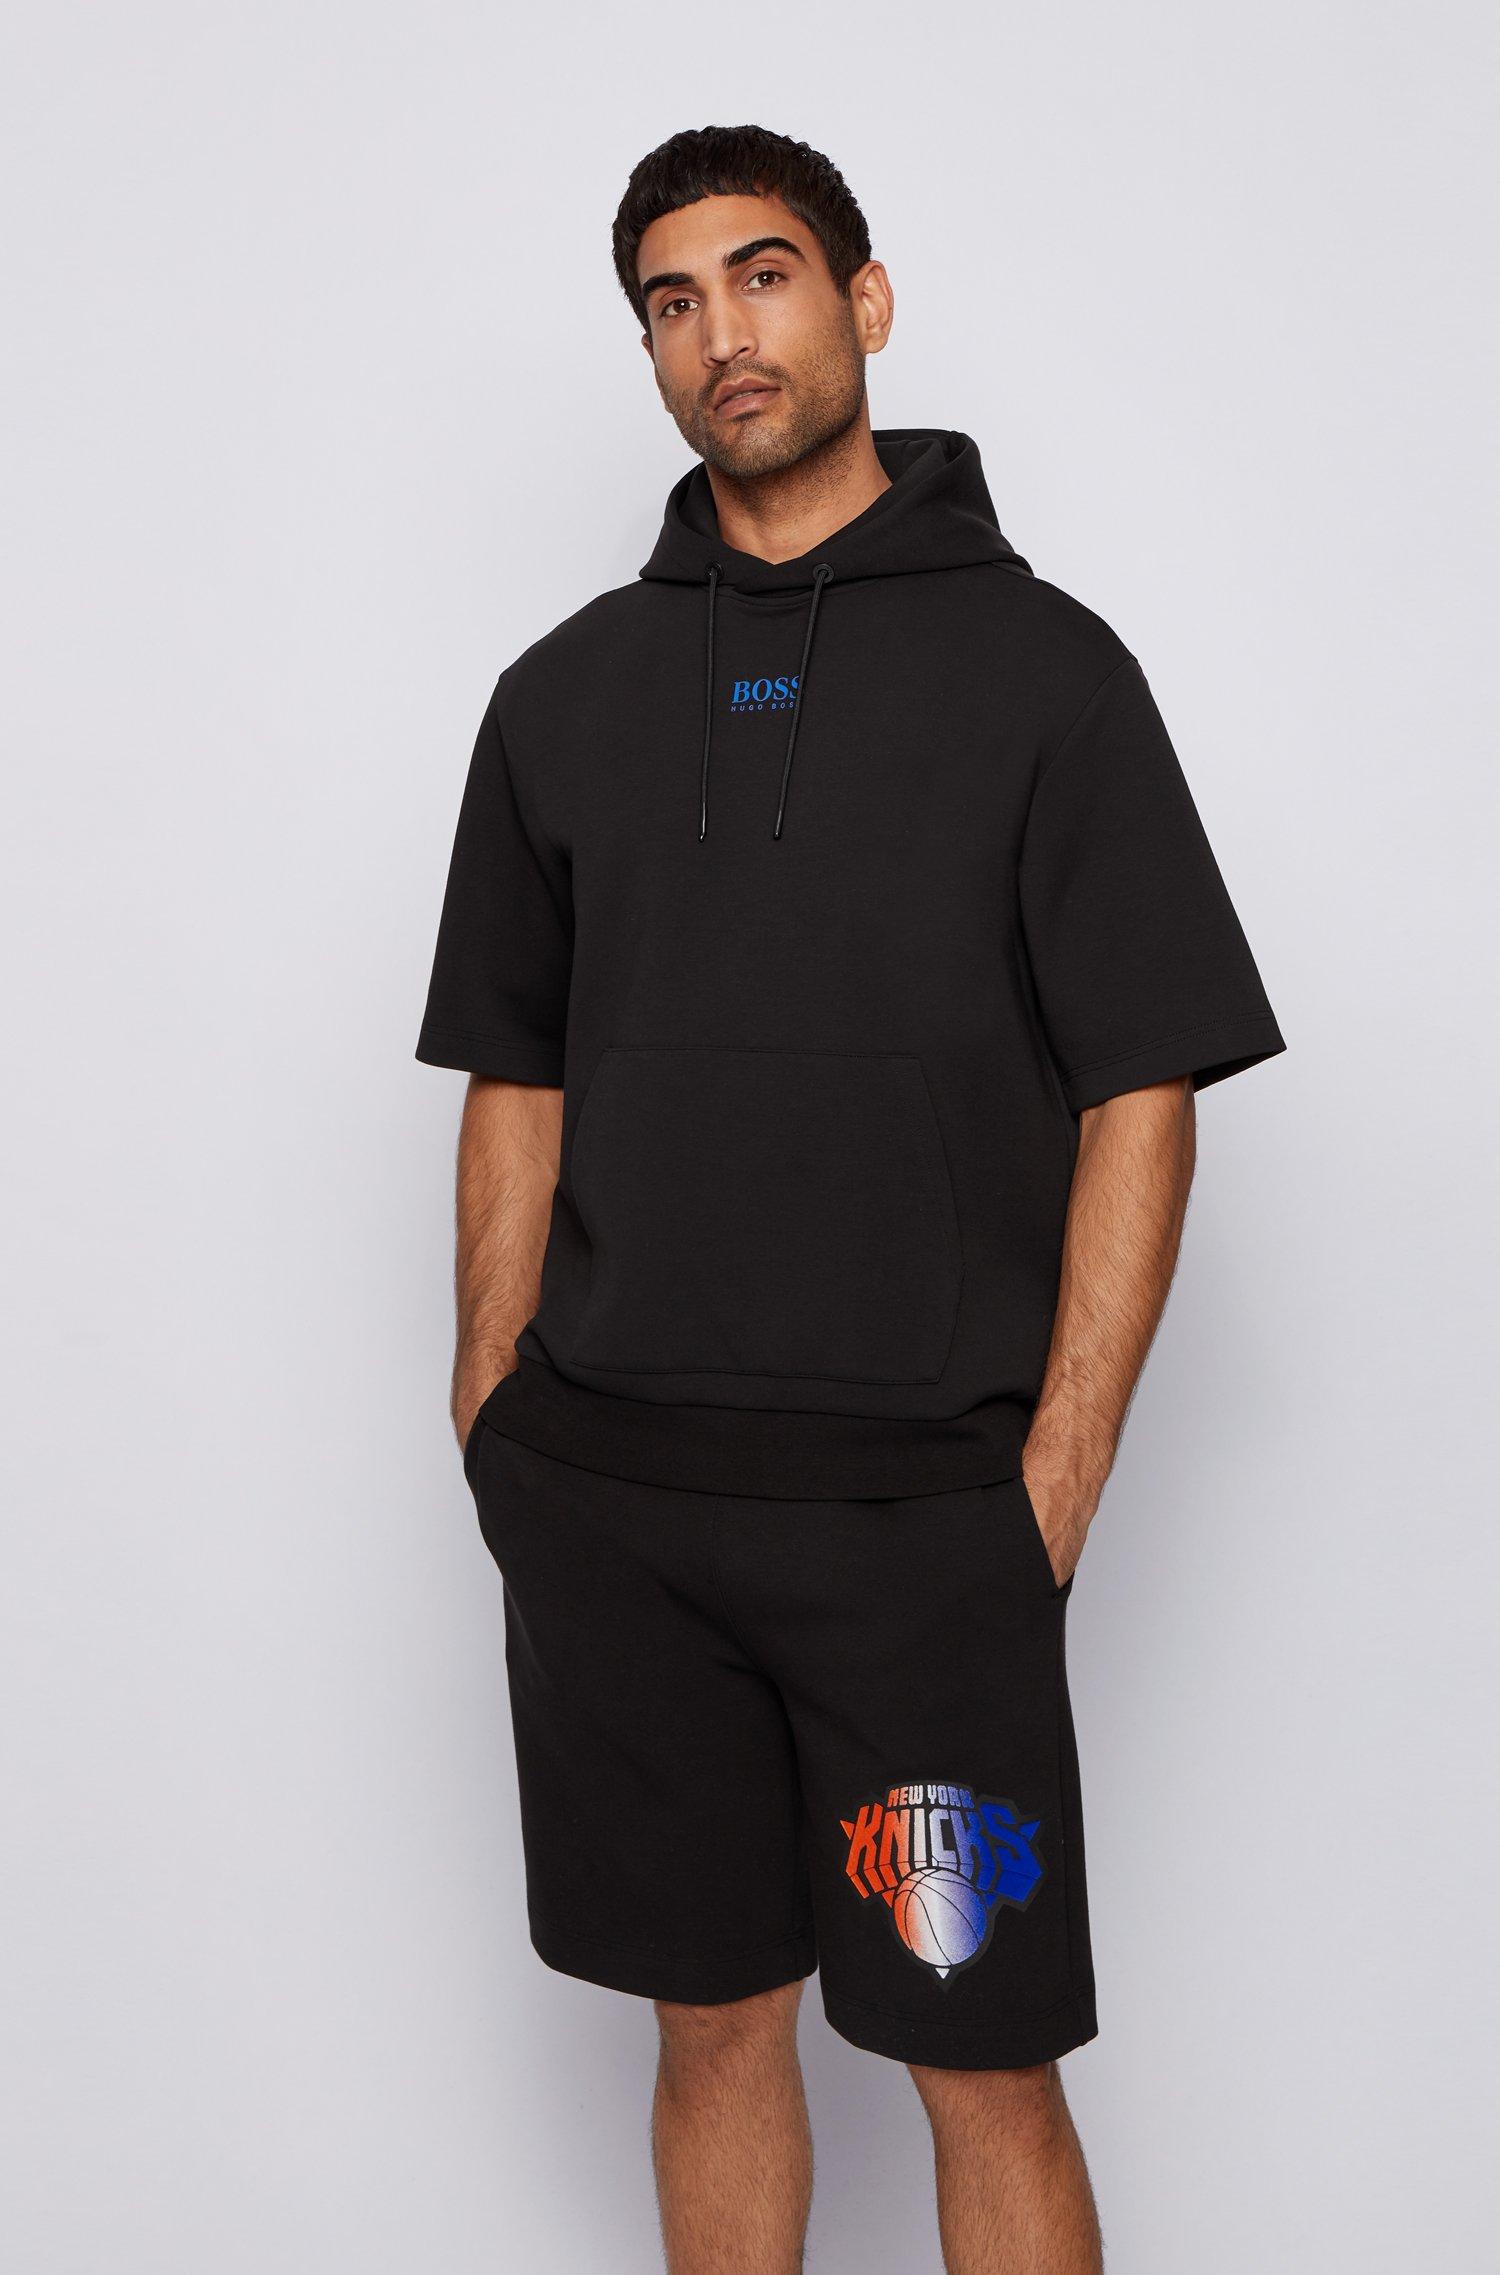 BOSS x NBA short-sleeved hoodie with team logo, Black